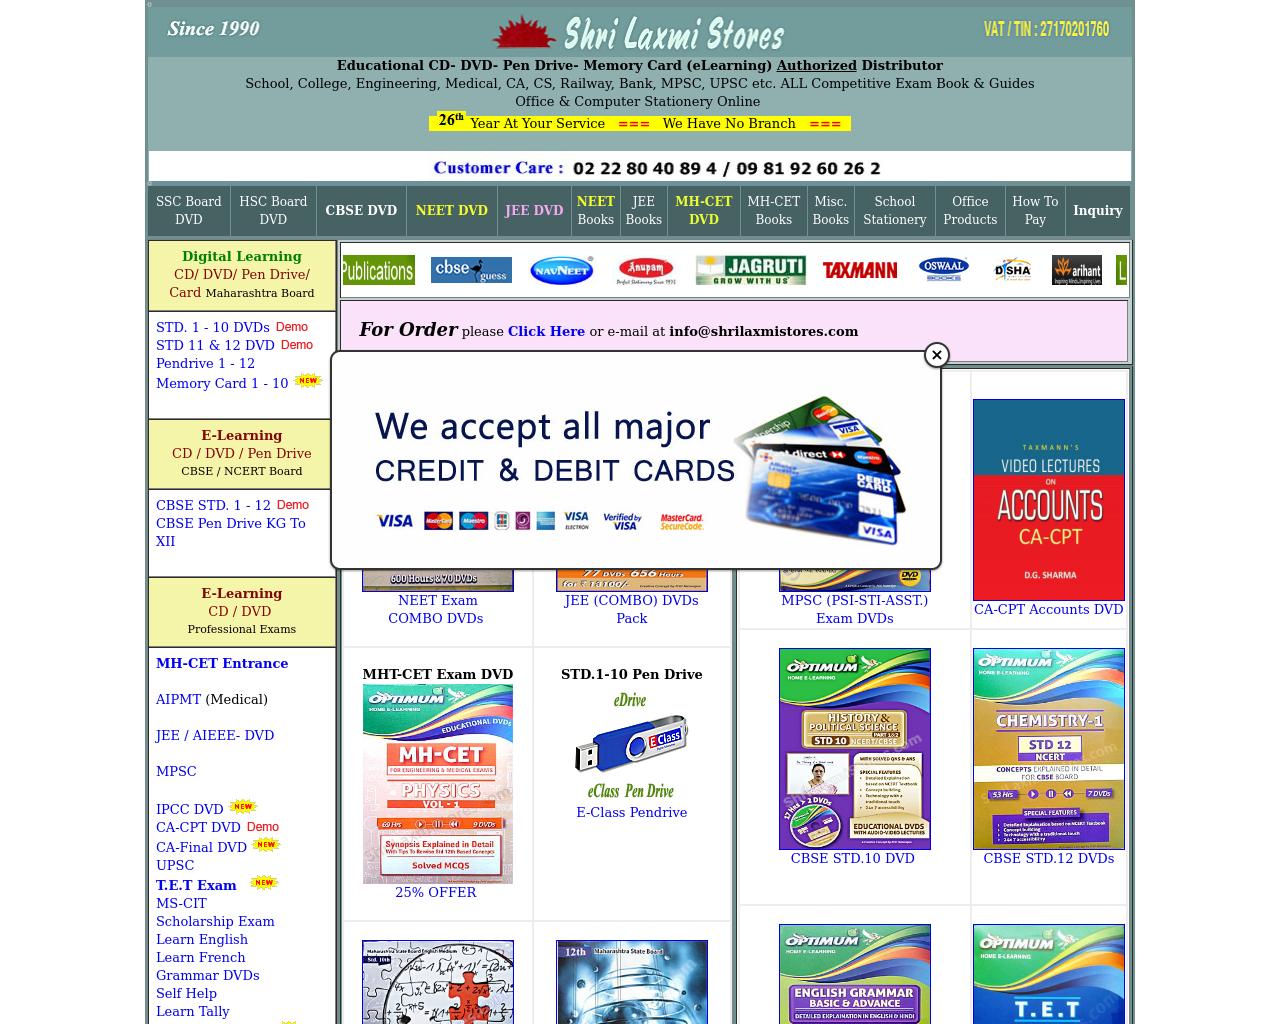 Shri-Laxmi-Stores-Advertising-Reviews-Pricing